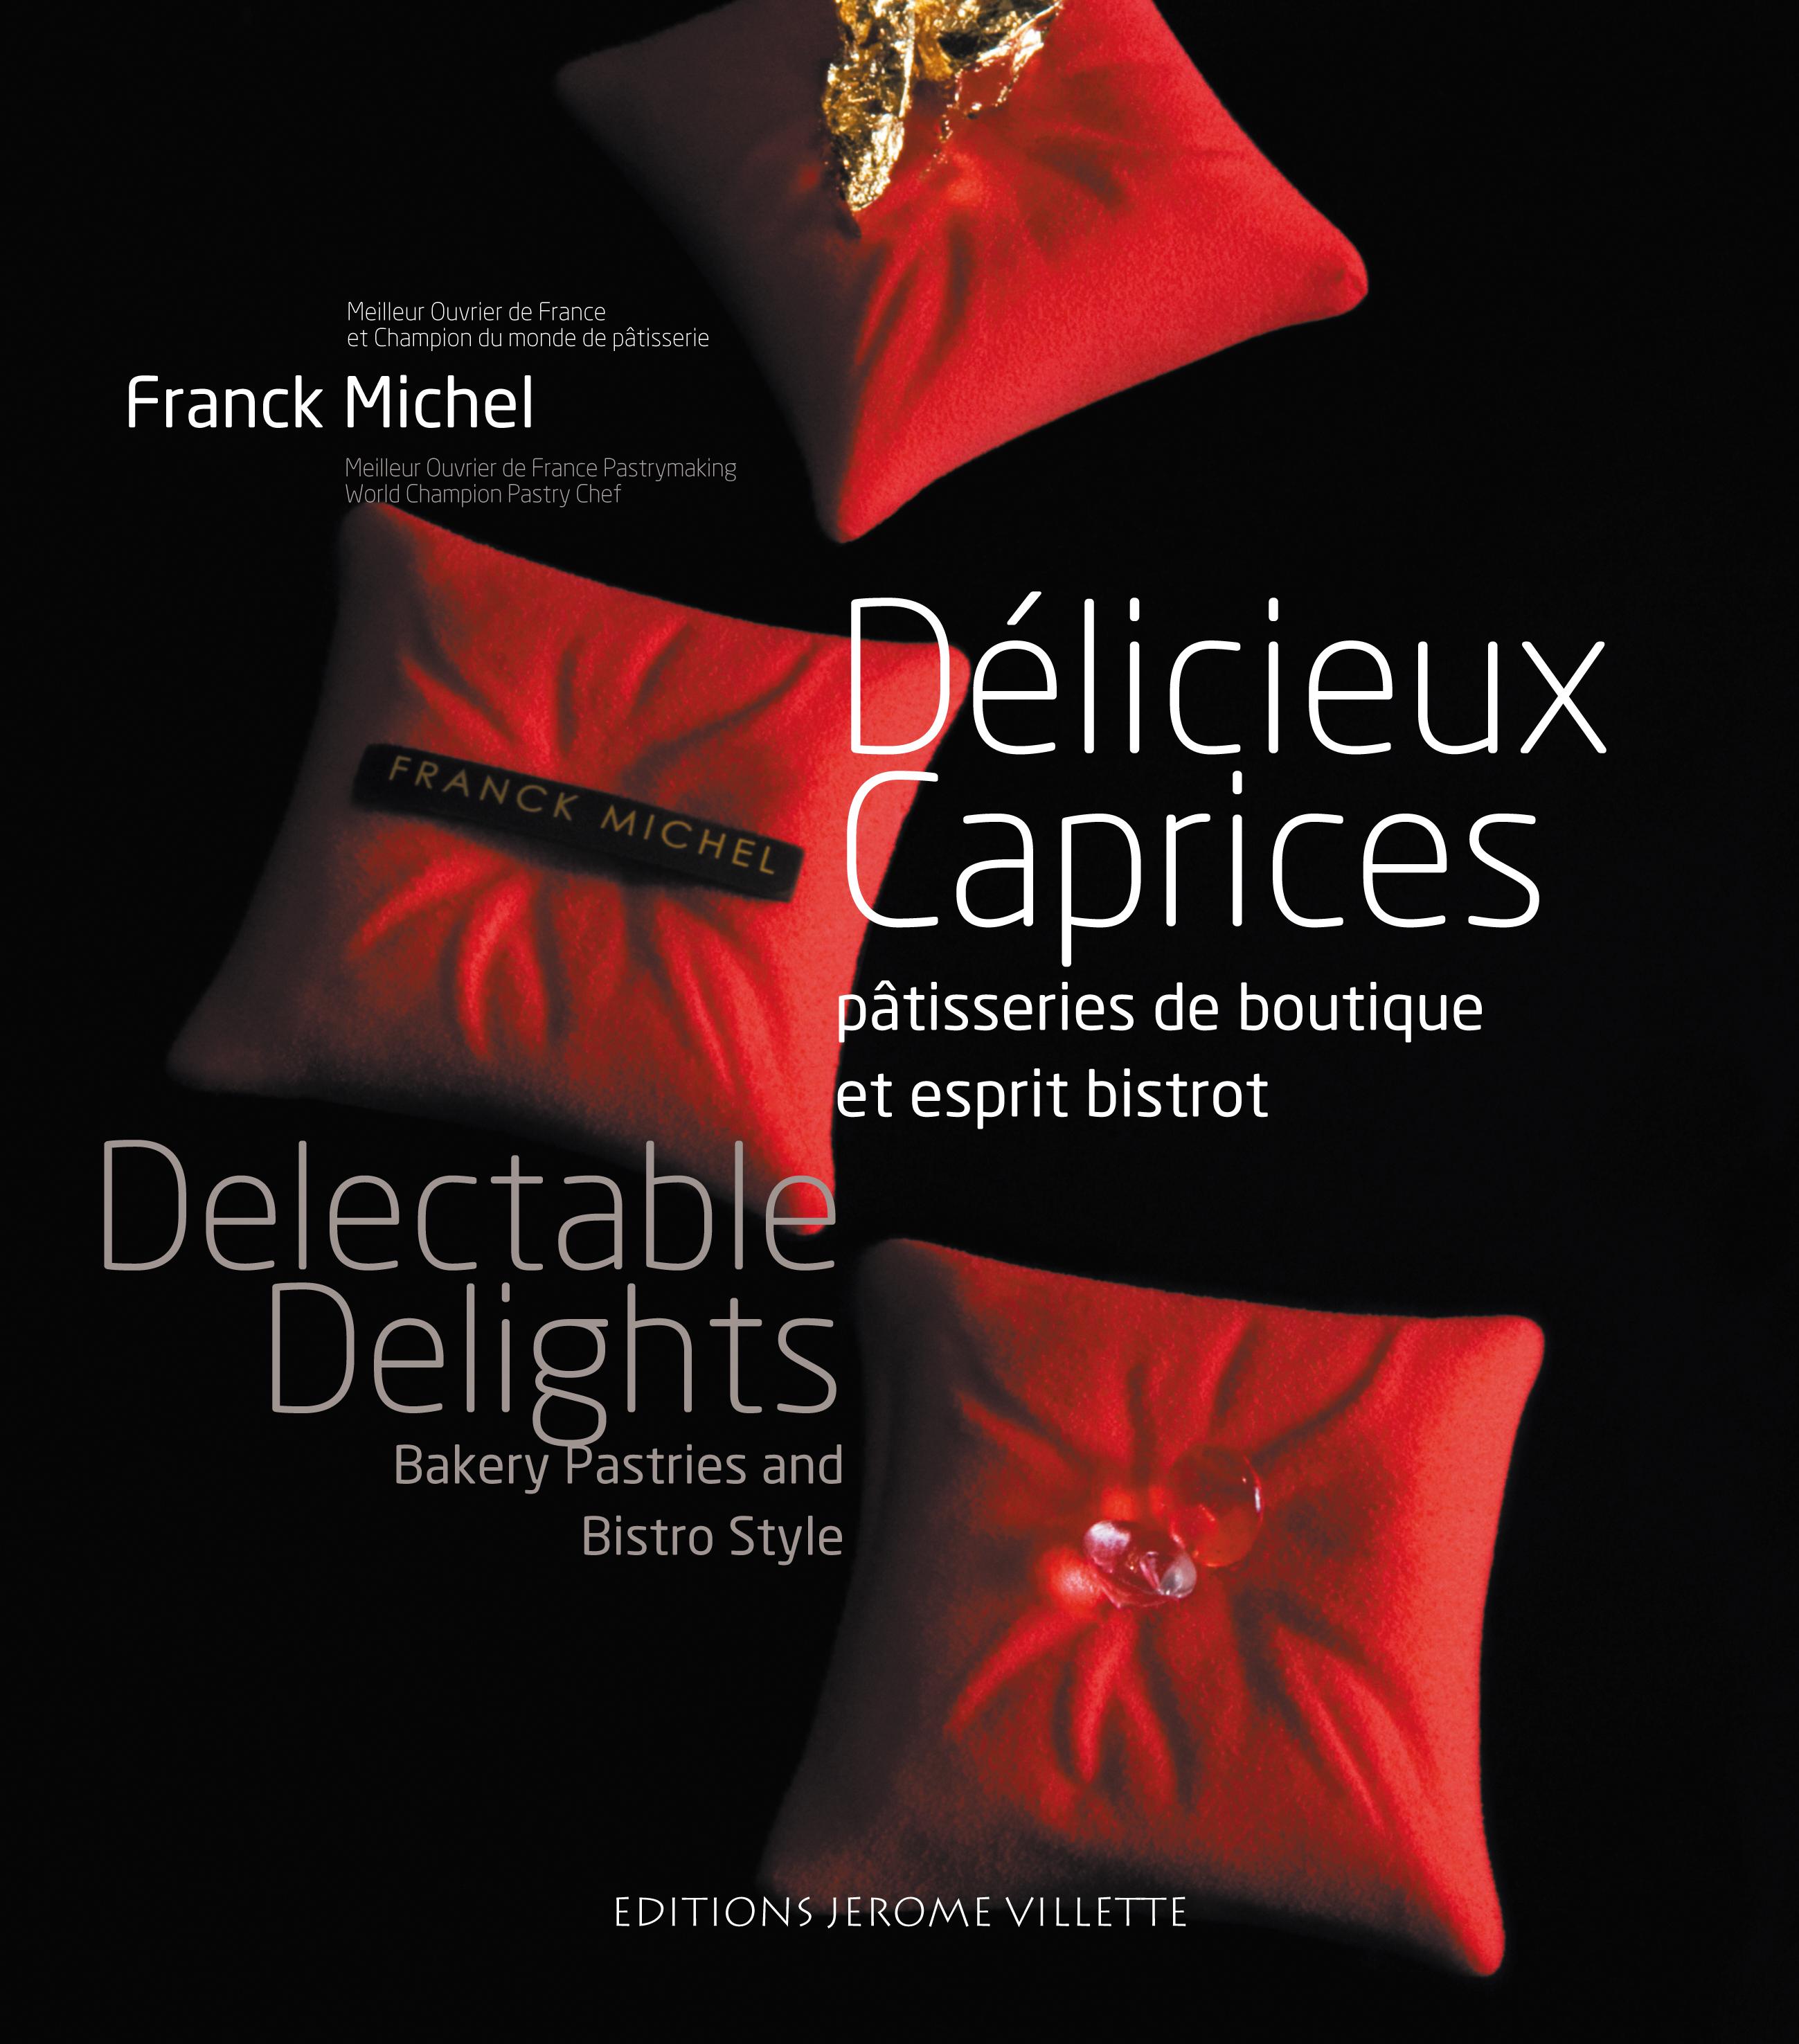 DELICIEUX CAPRICES